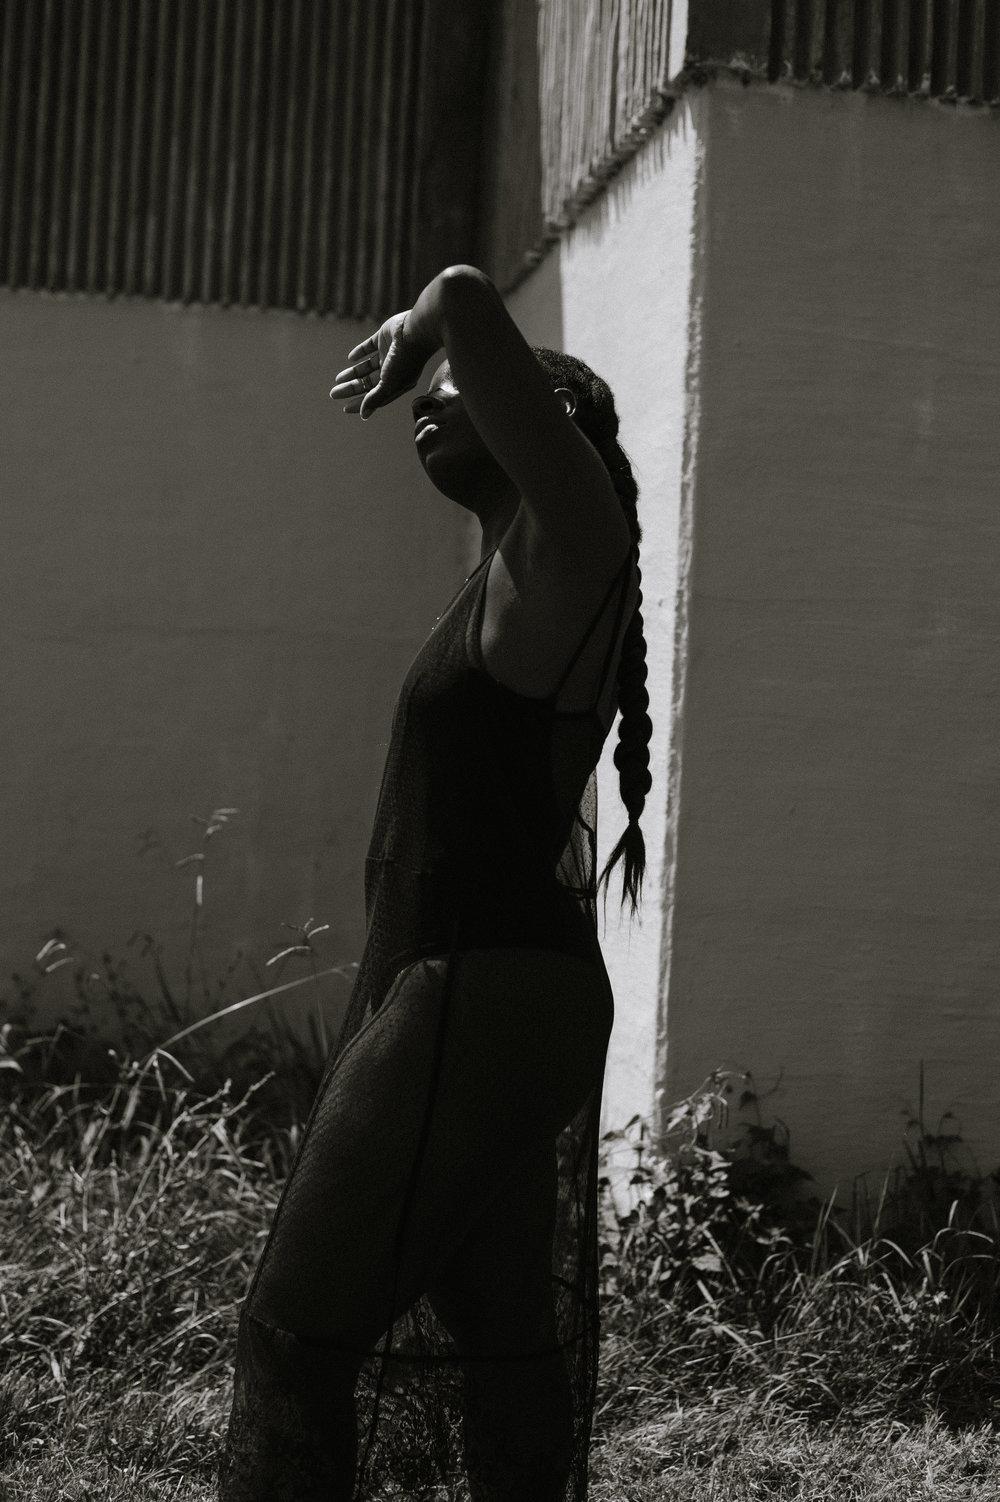 Tasha-James-The-Glossier-Blogger-Fashion-Style-HM-Lace-Dress-Black-50.jpg